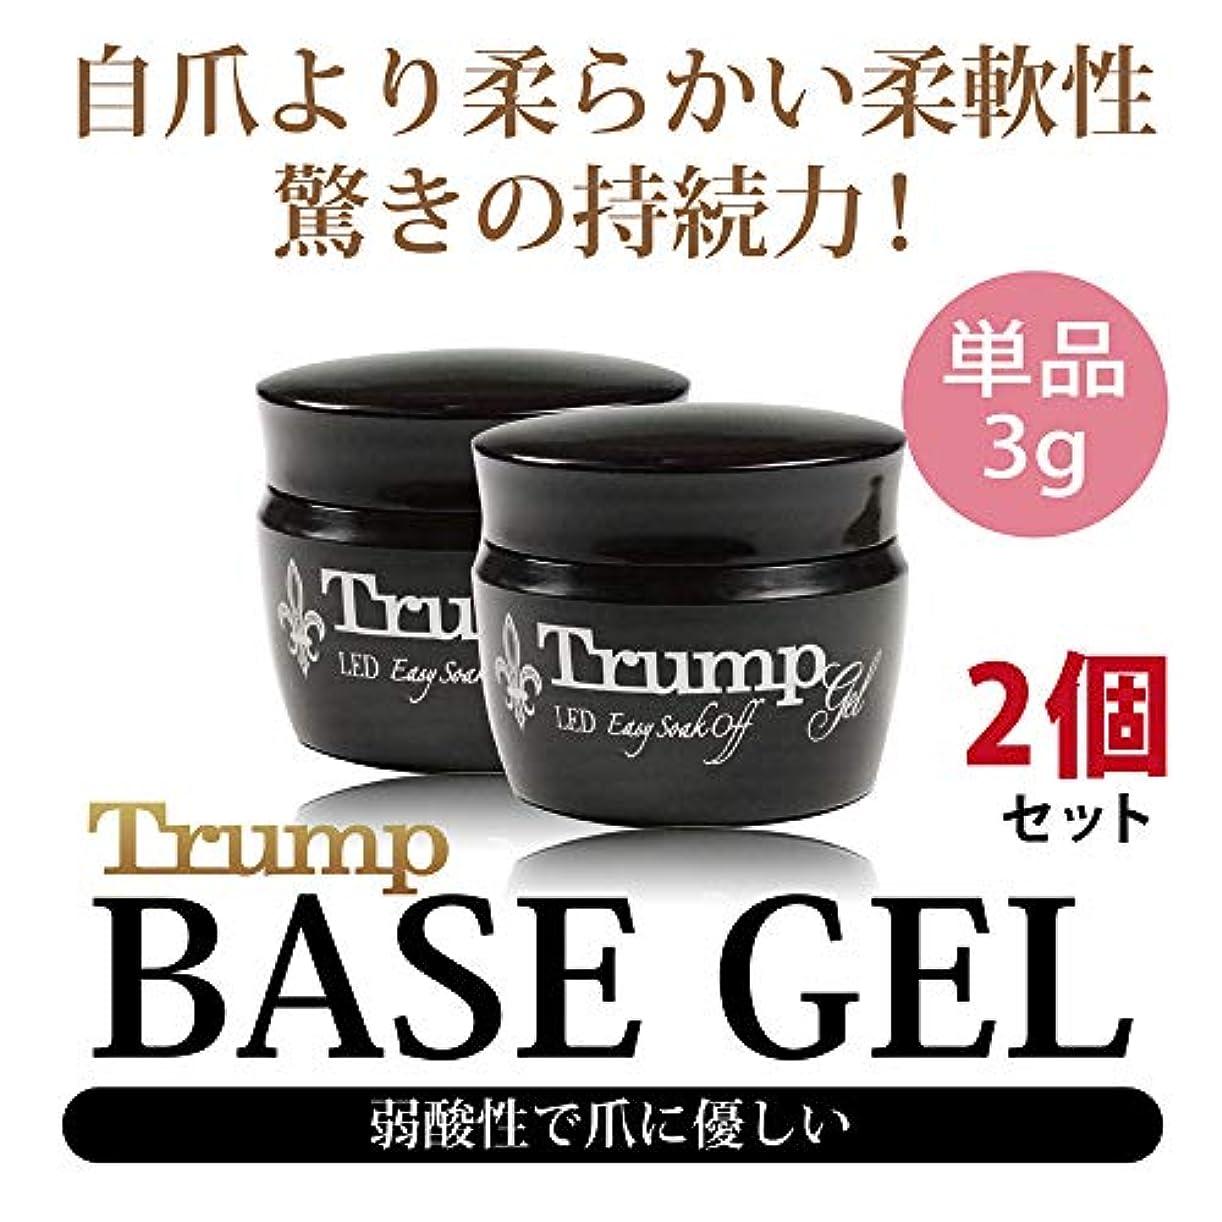 Trump gel ベースジェル 3g 2個セット